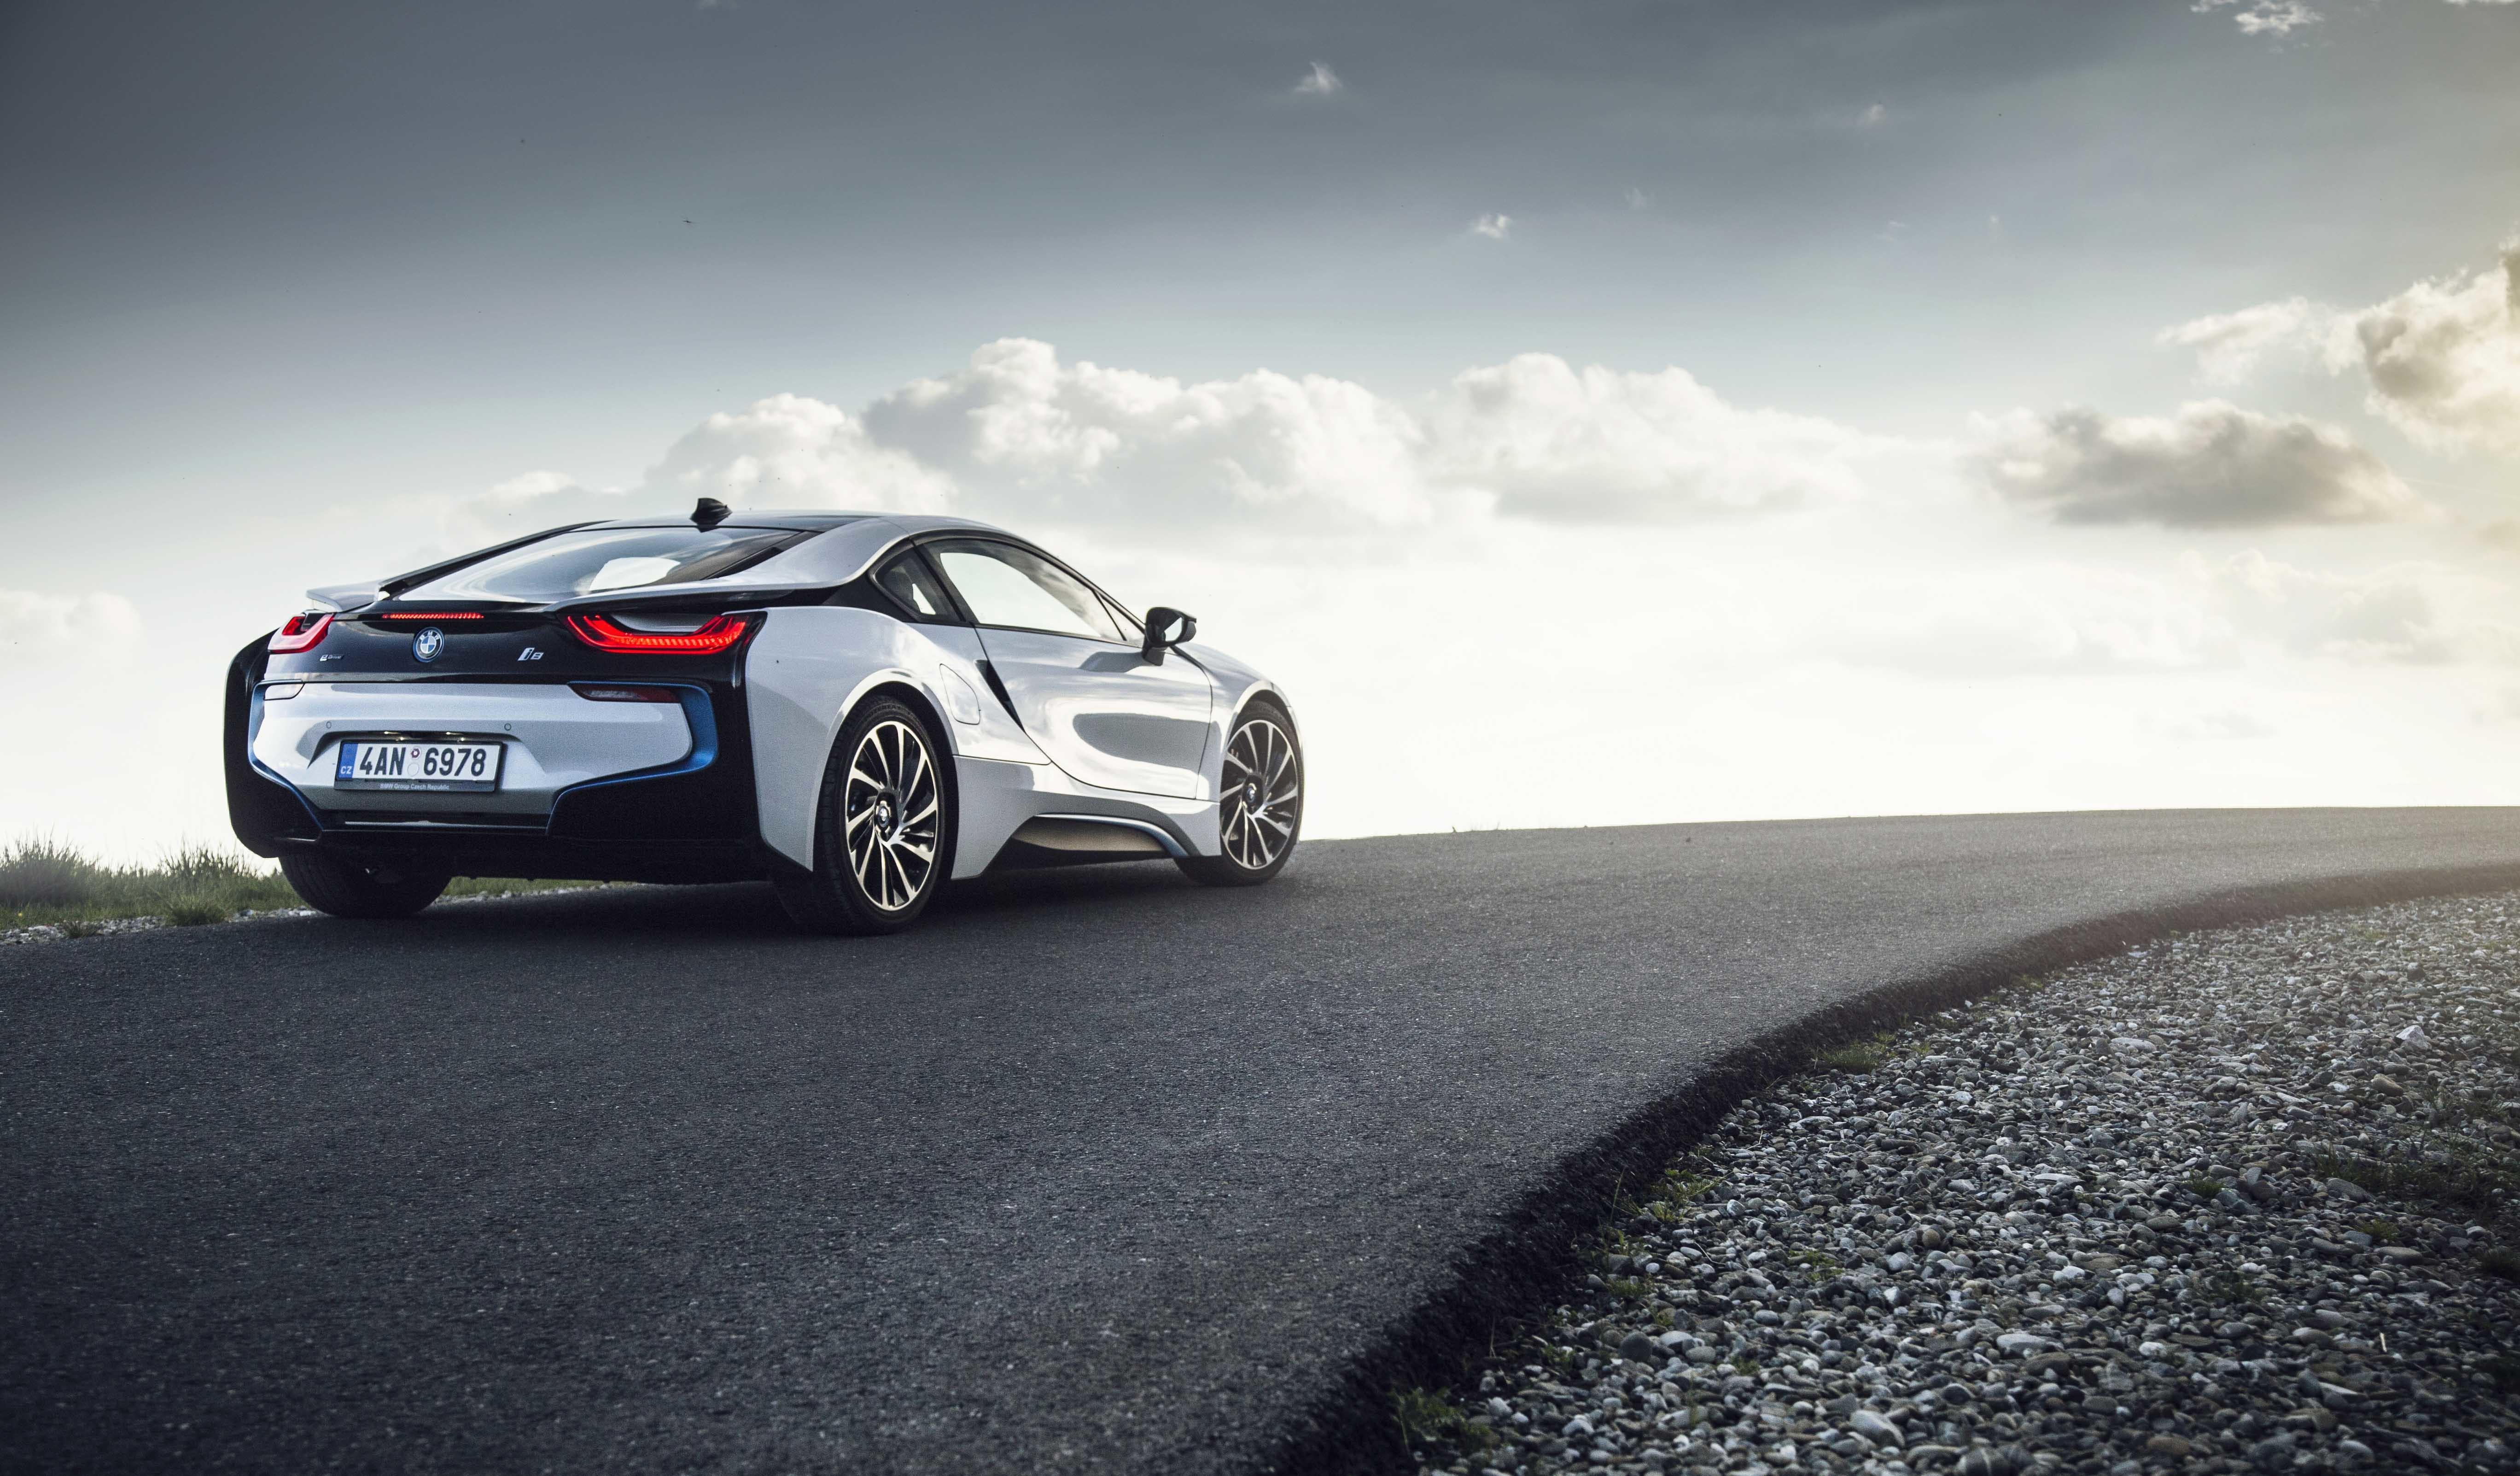 Wallpaper : Road, BMW I8, Rear View, Sports Car, Porsche